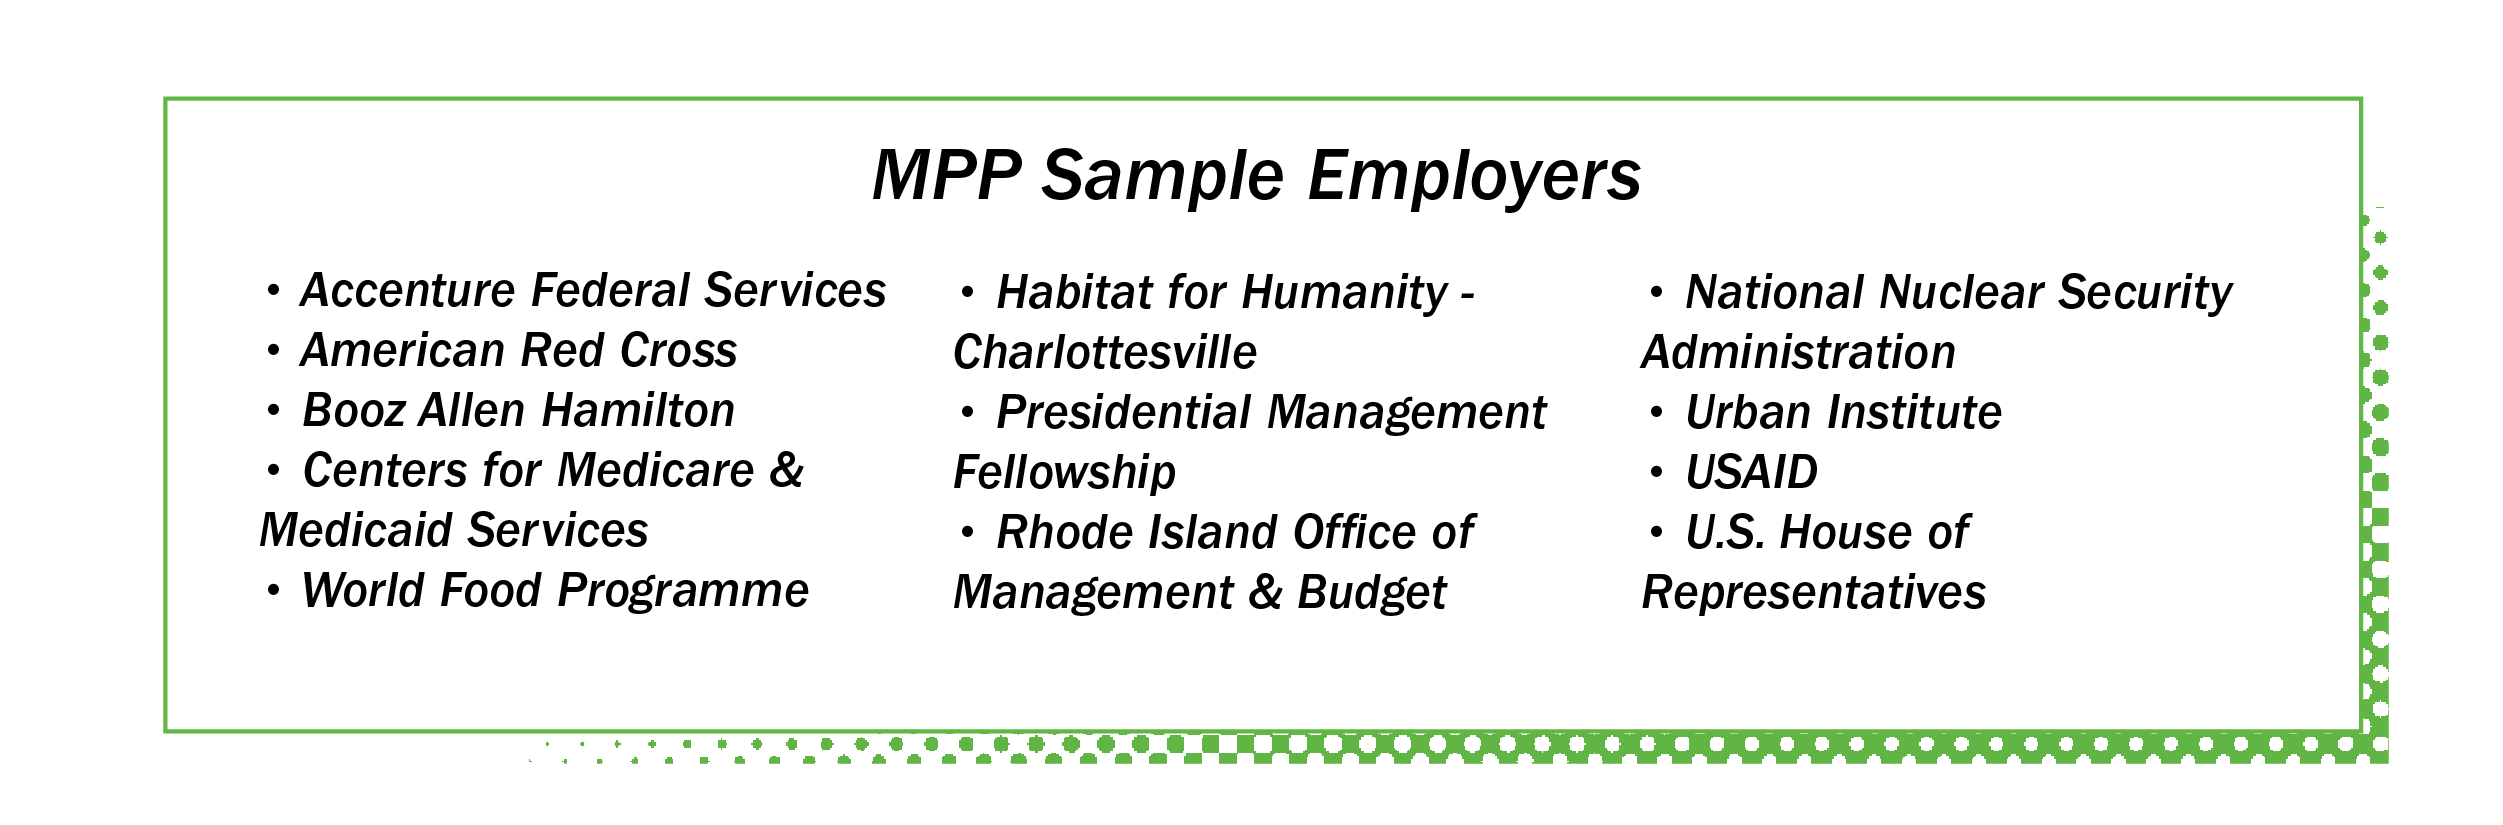 MPP Sample Employers